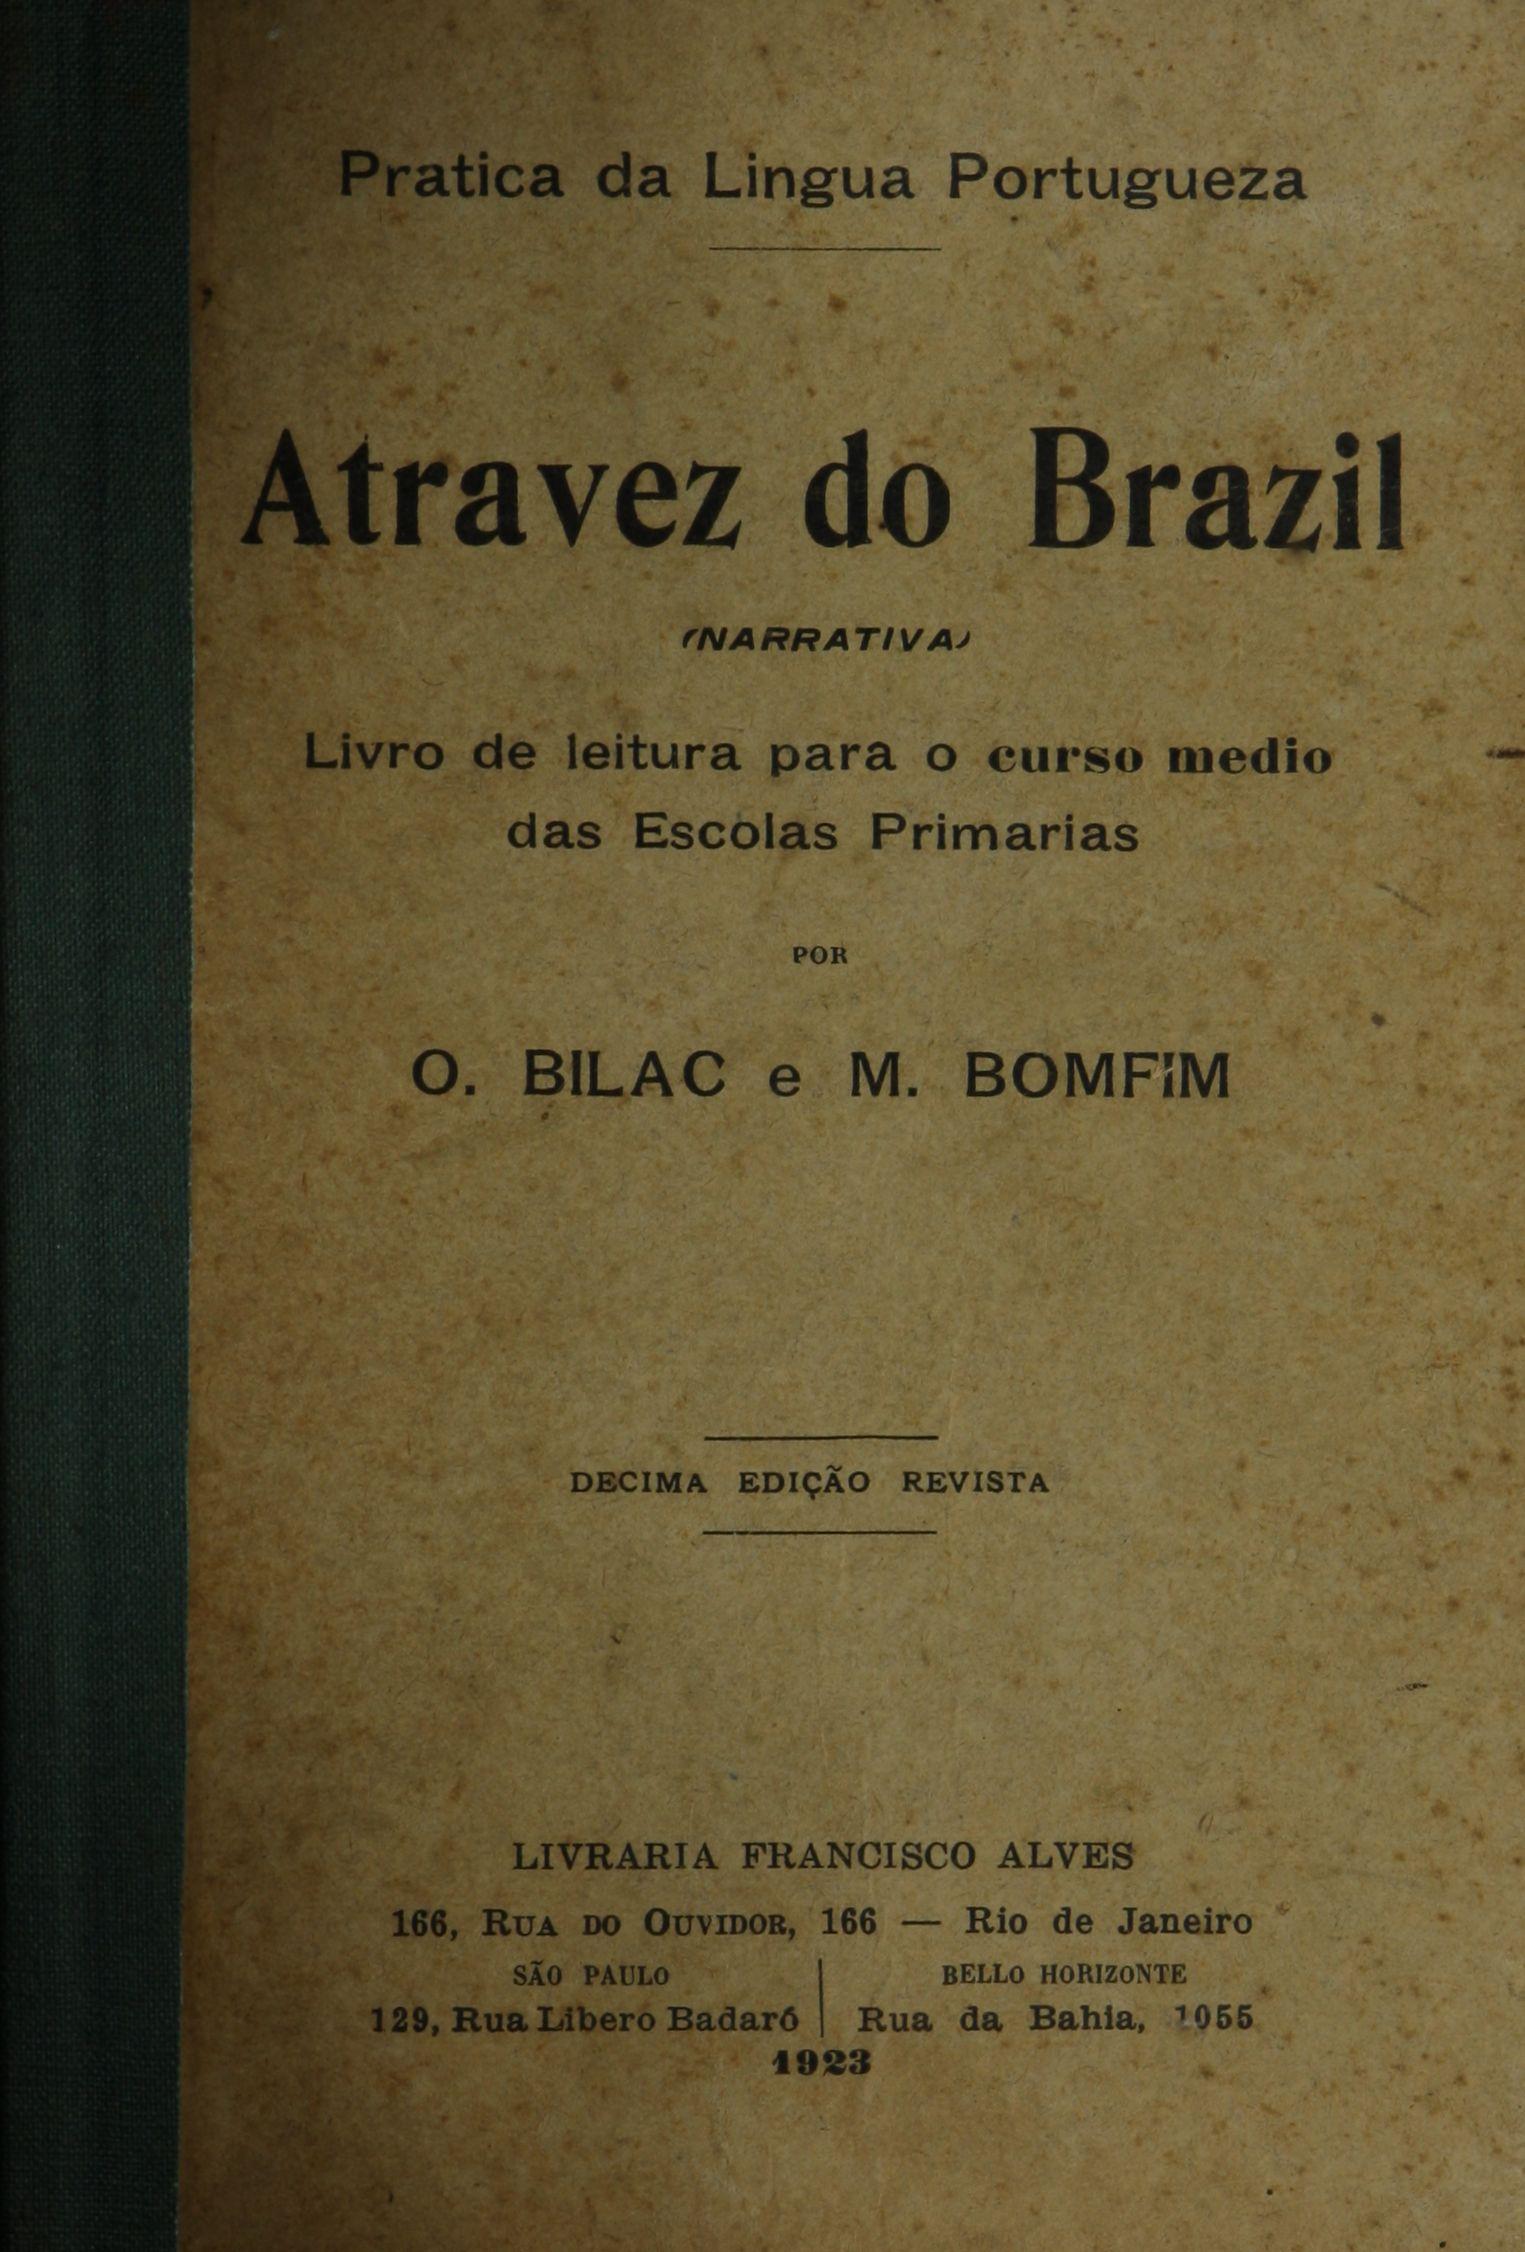 Biblioteca Brasiliana Guita e José Mindlin: Atravez do